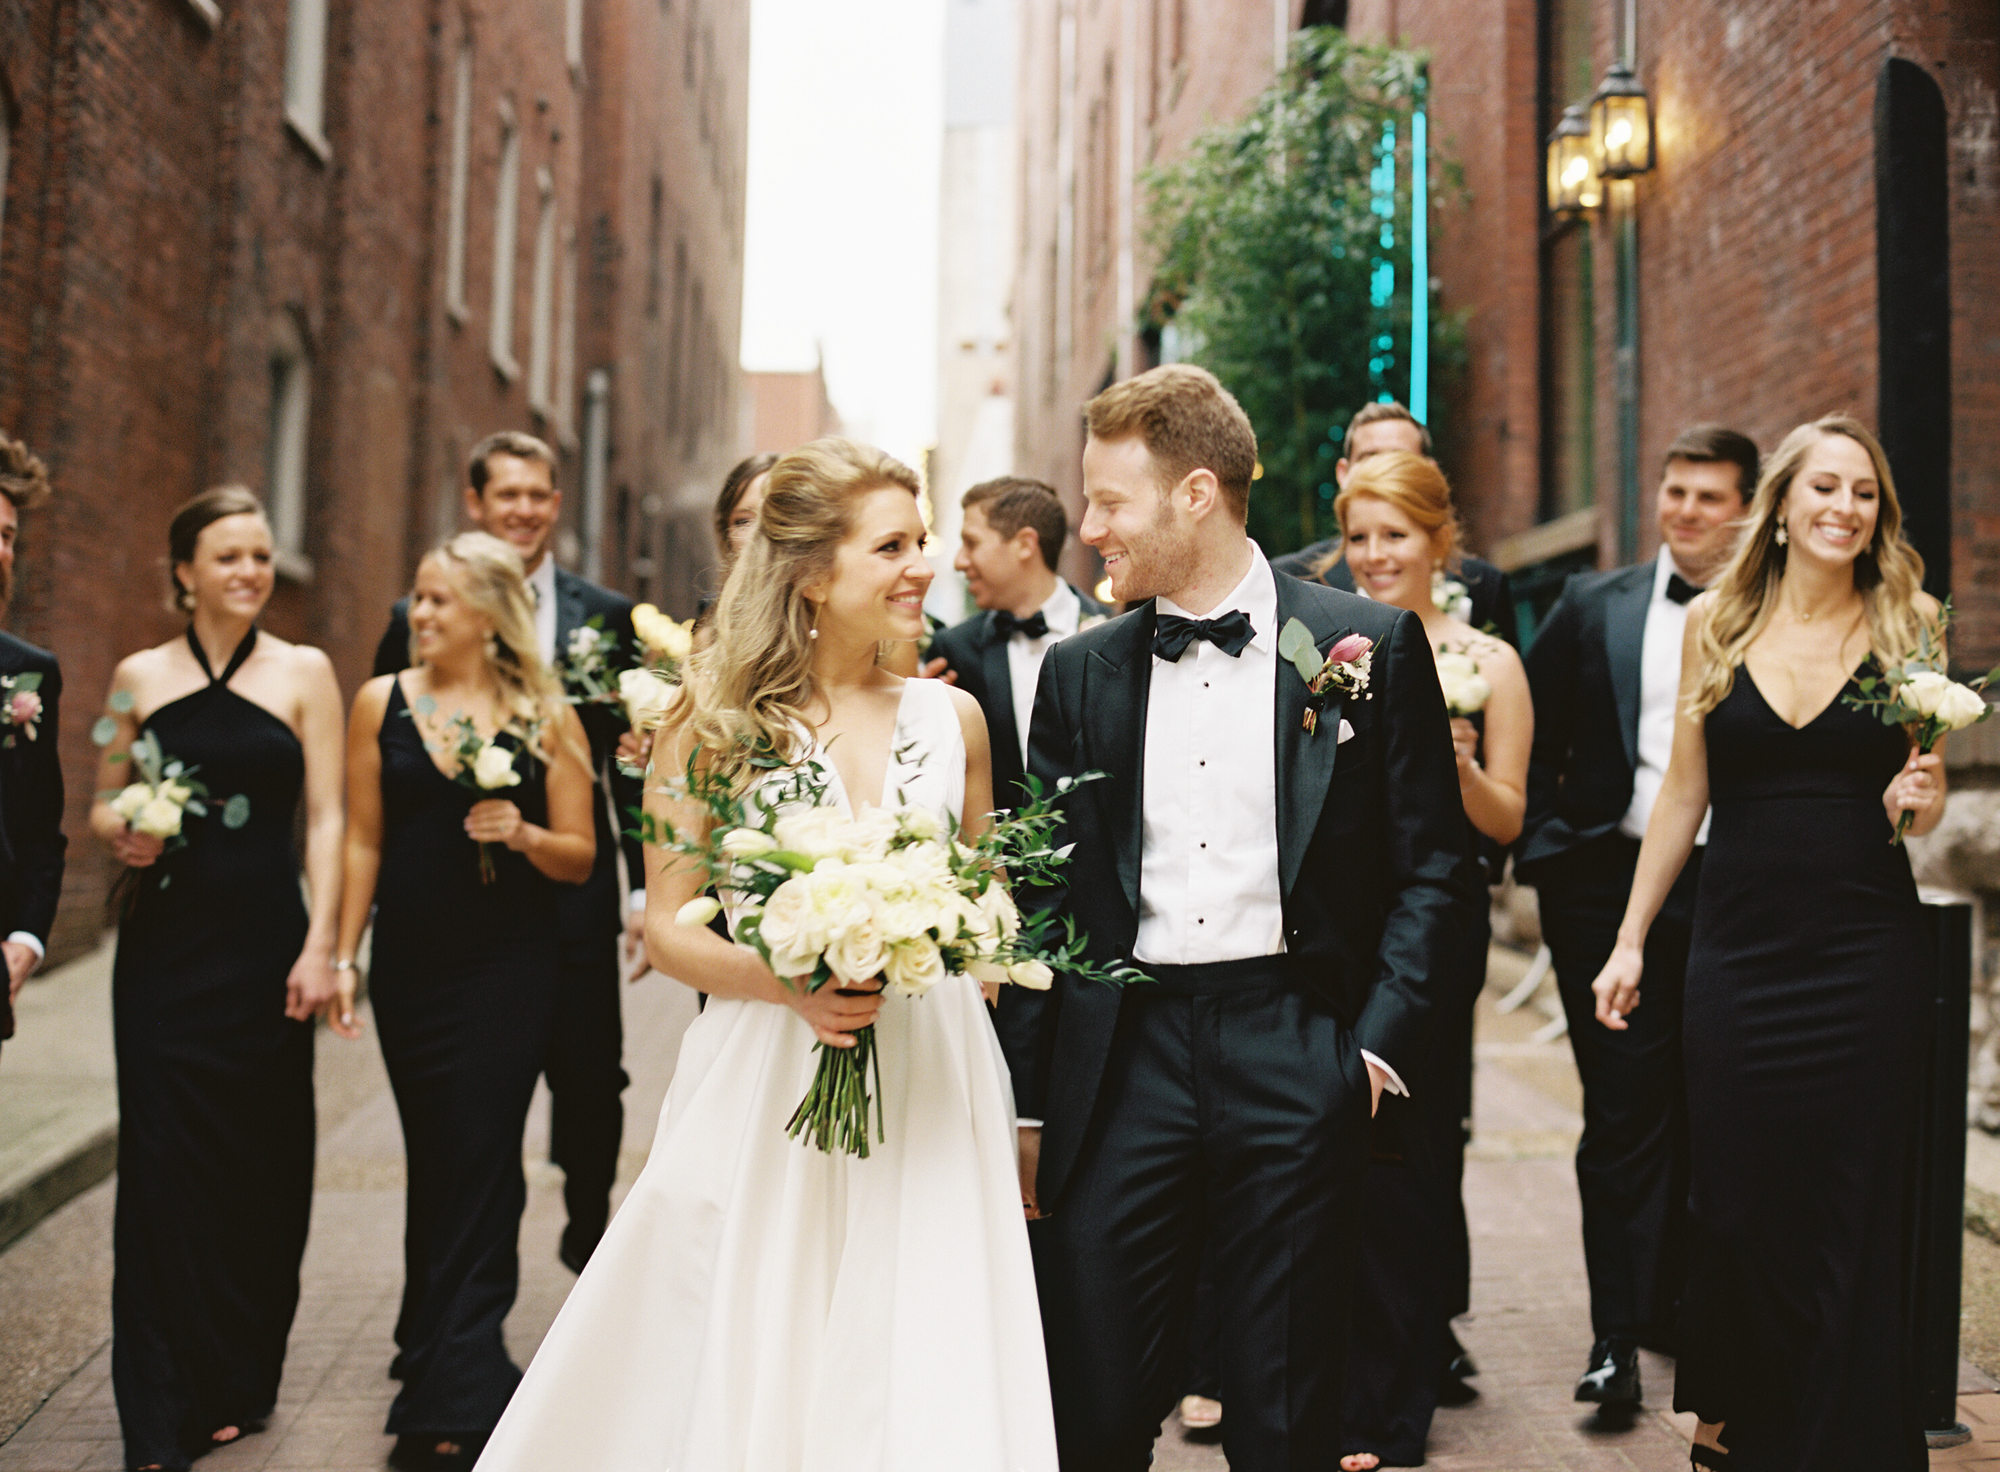 Nashville Wedding 21c Hotel and Museum-011.jpg